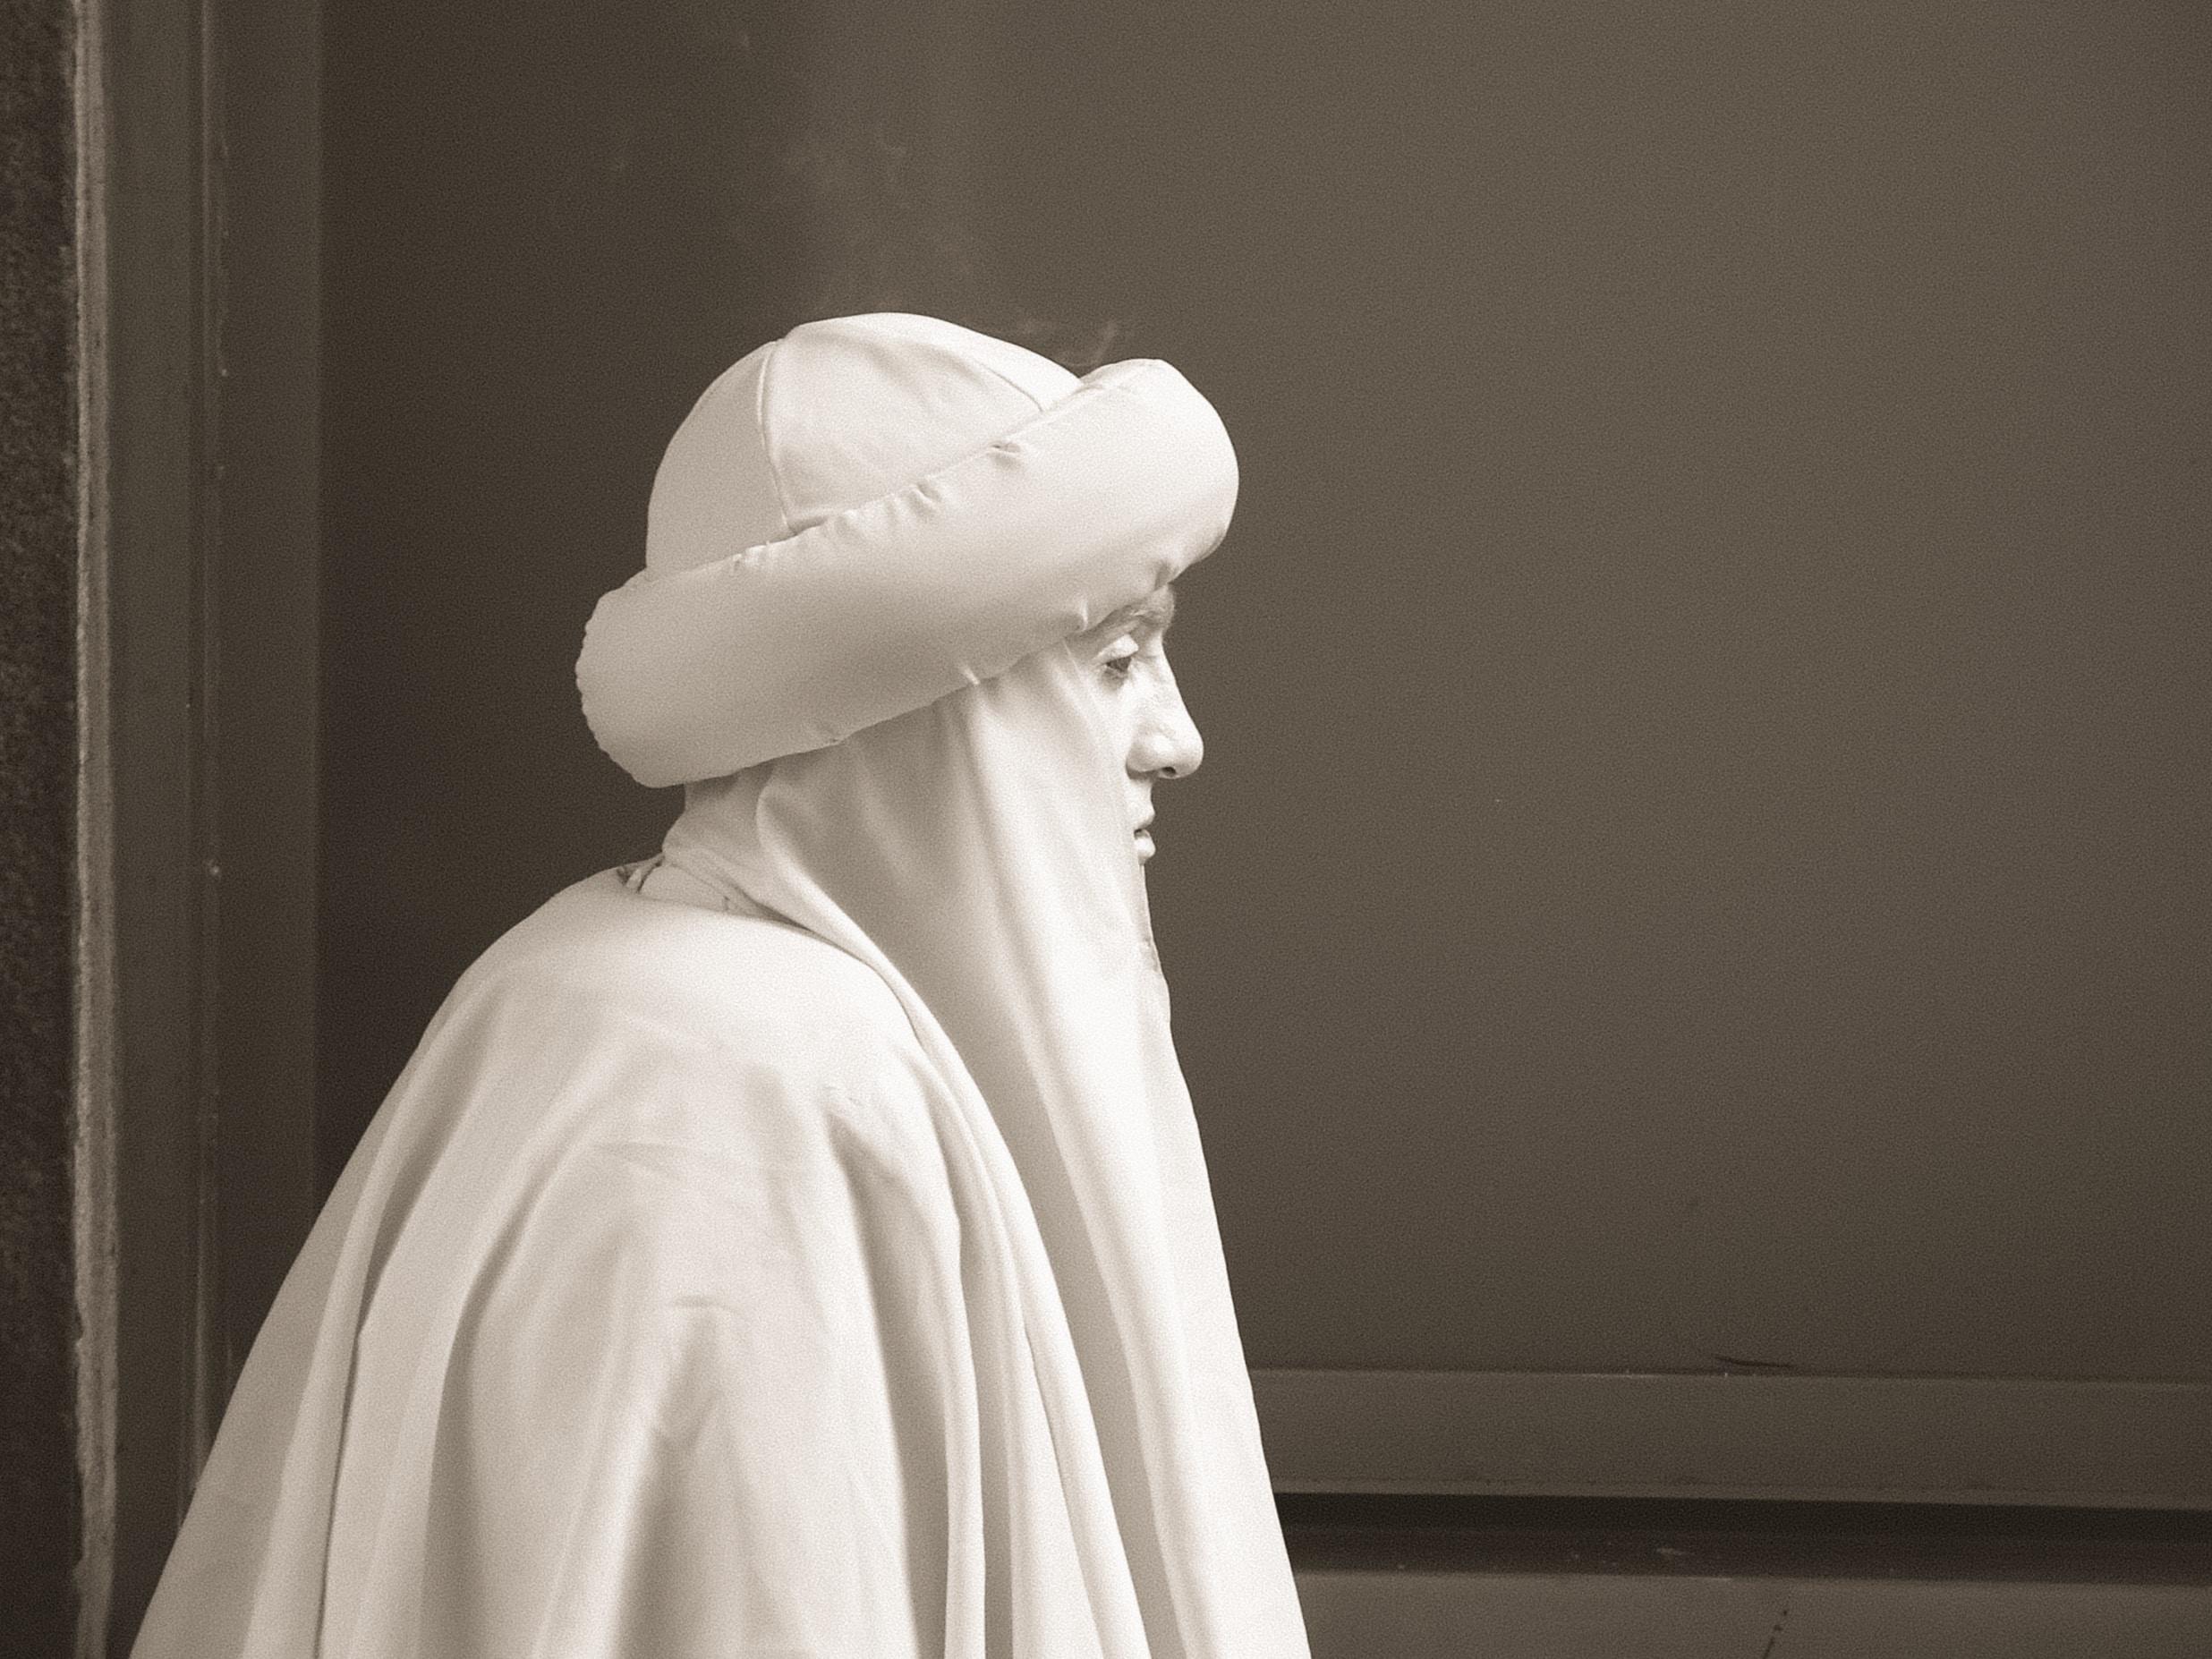 man in white garments